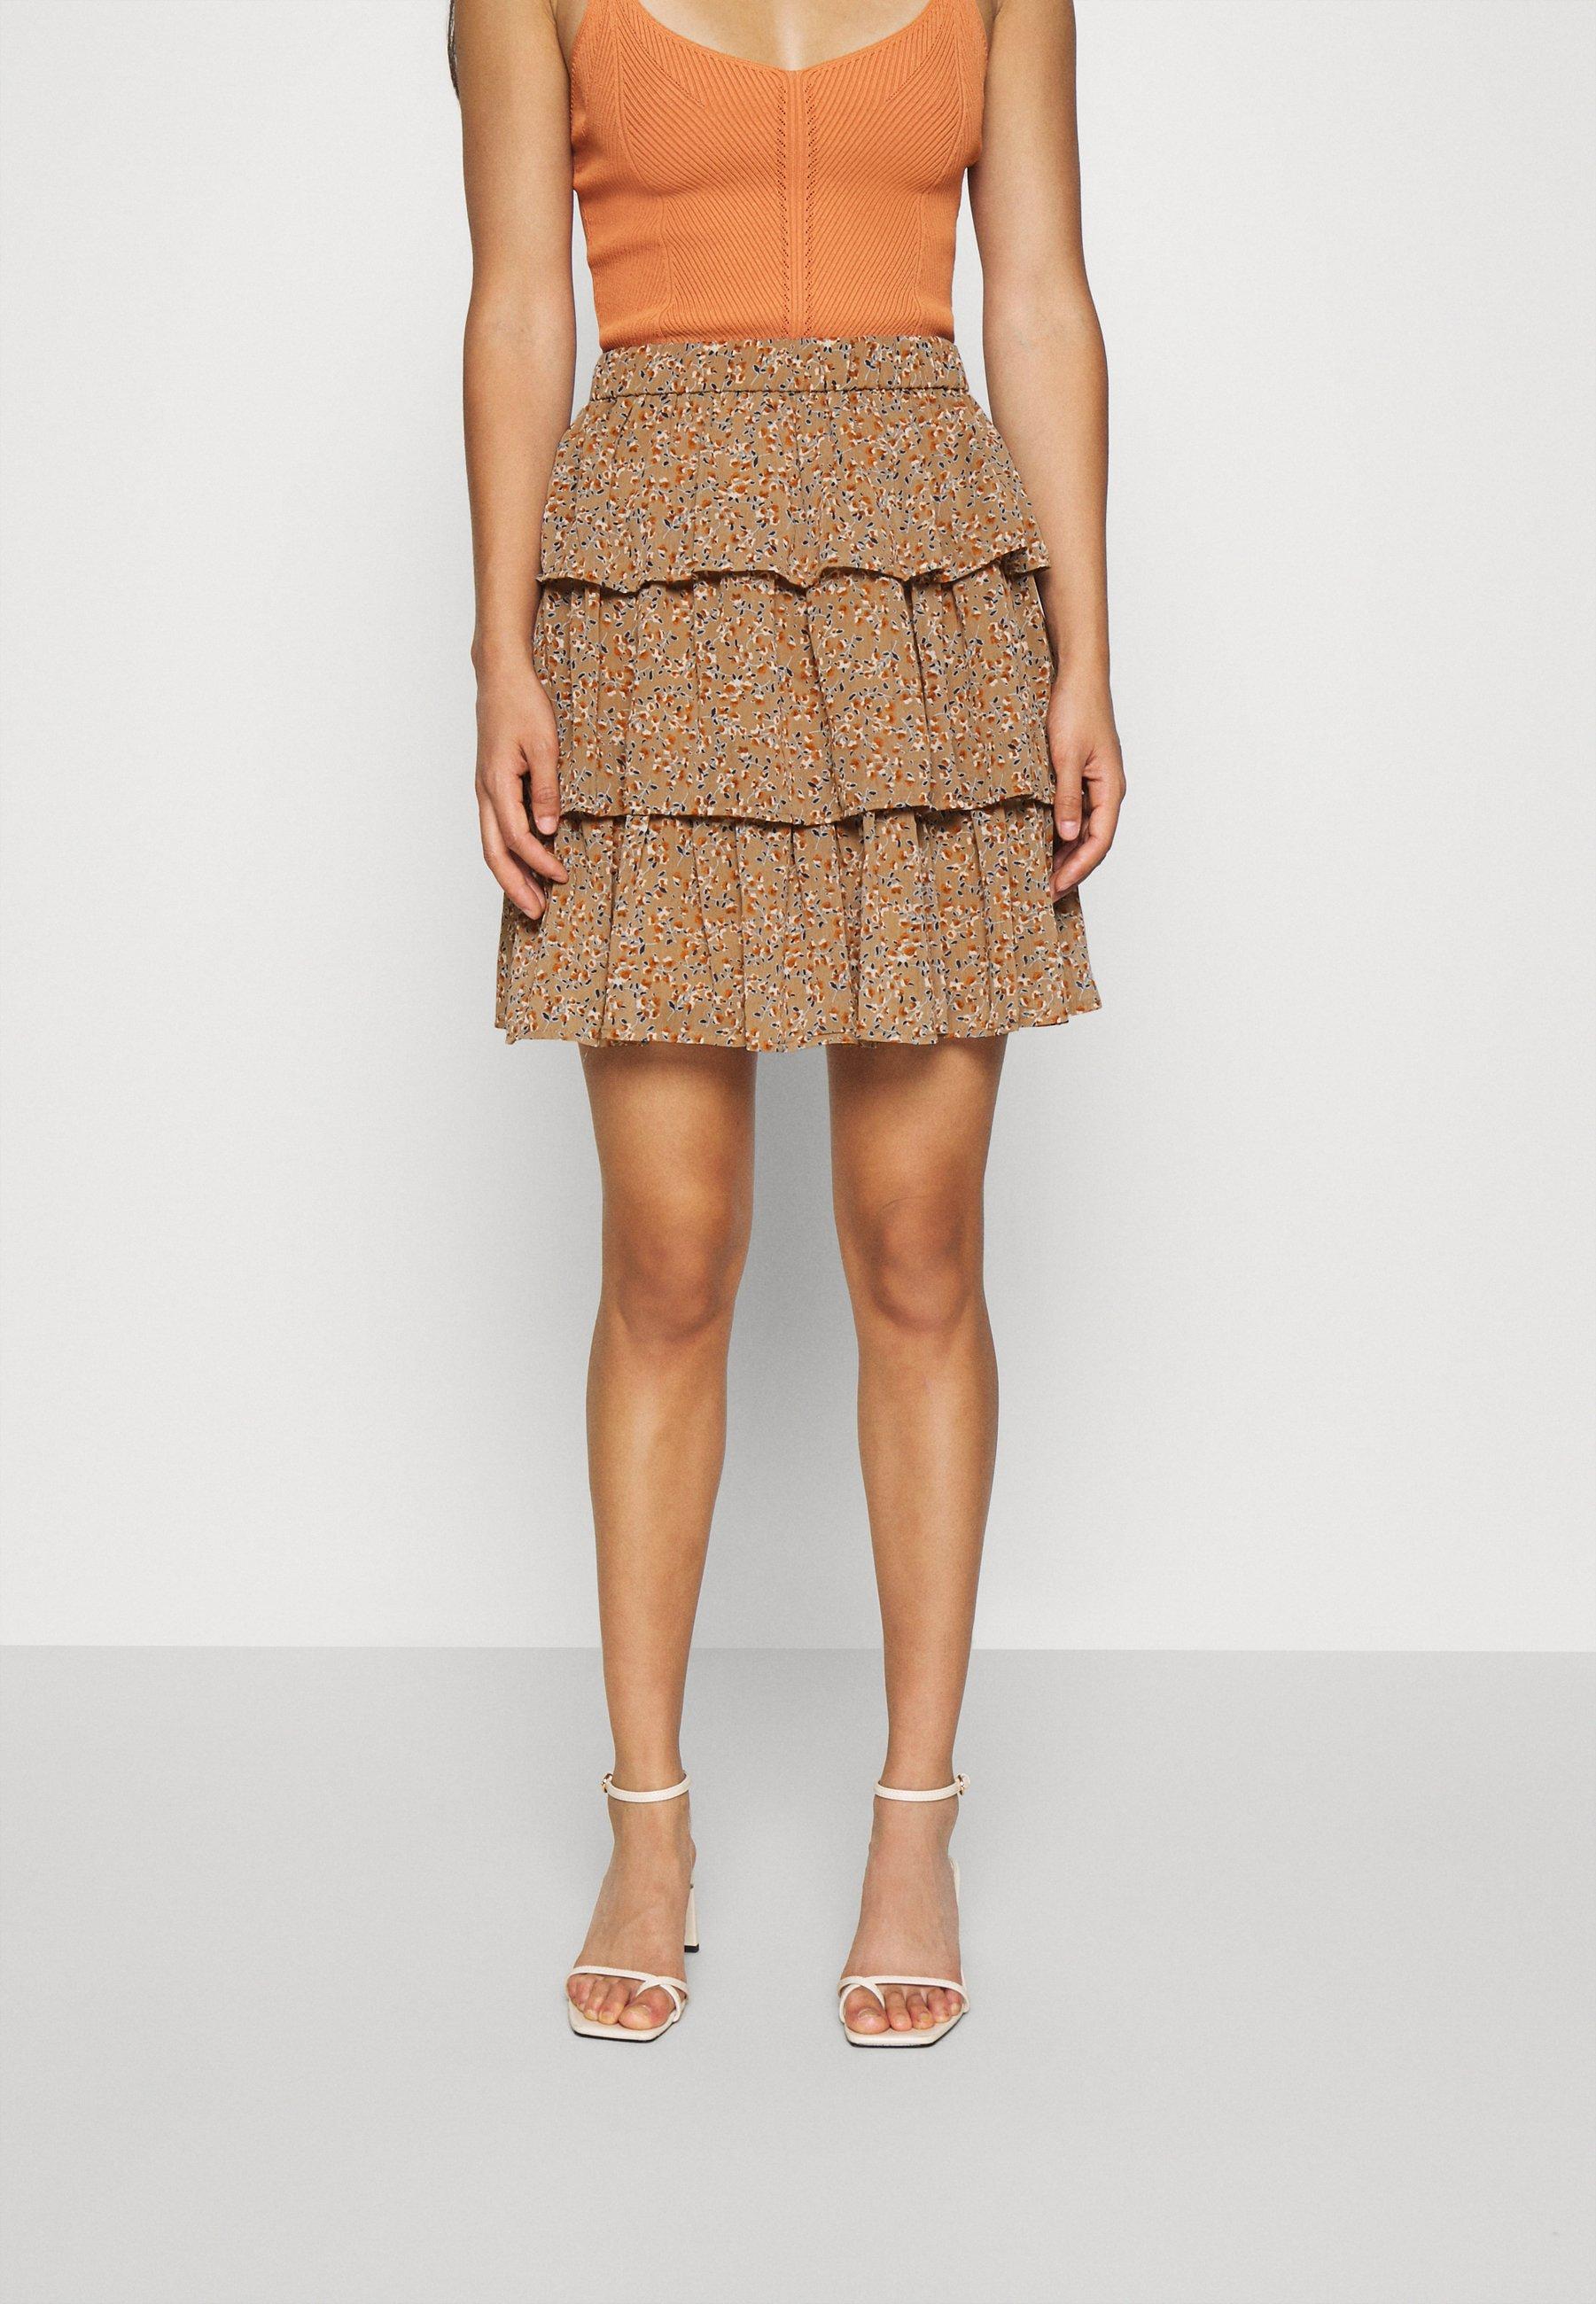 Women YASANEMONE SKIRT  - A-line skirt - tawny brown/anemone